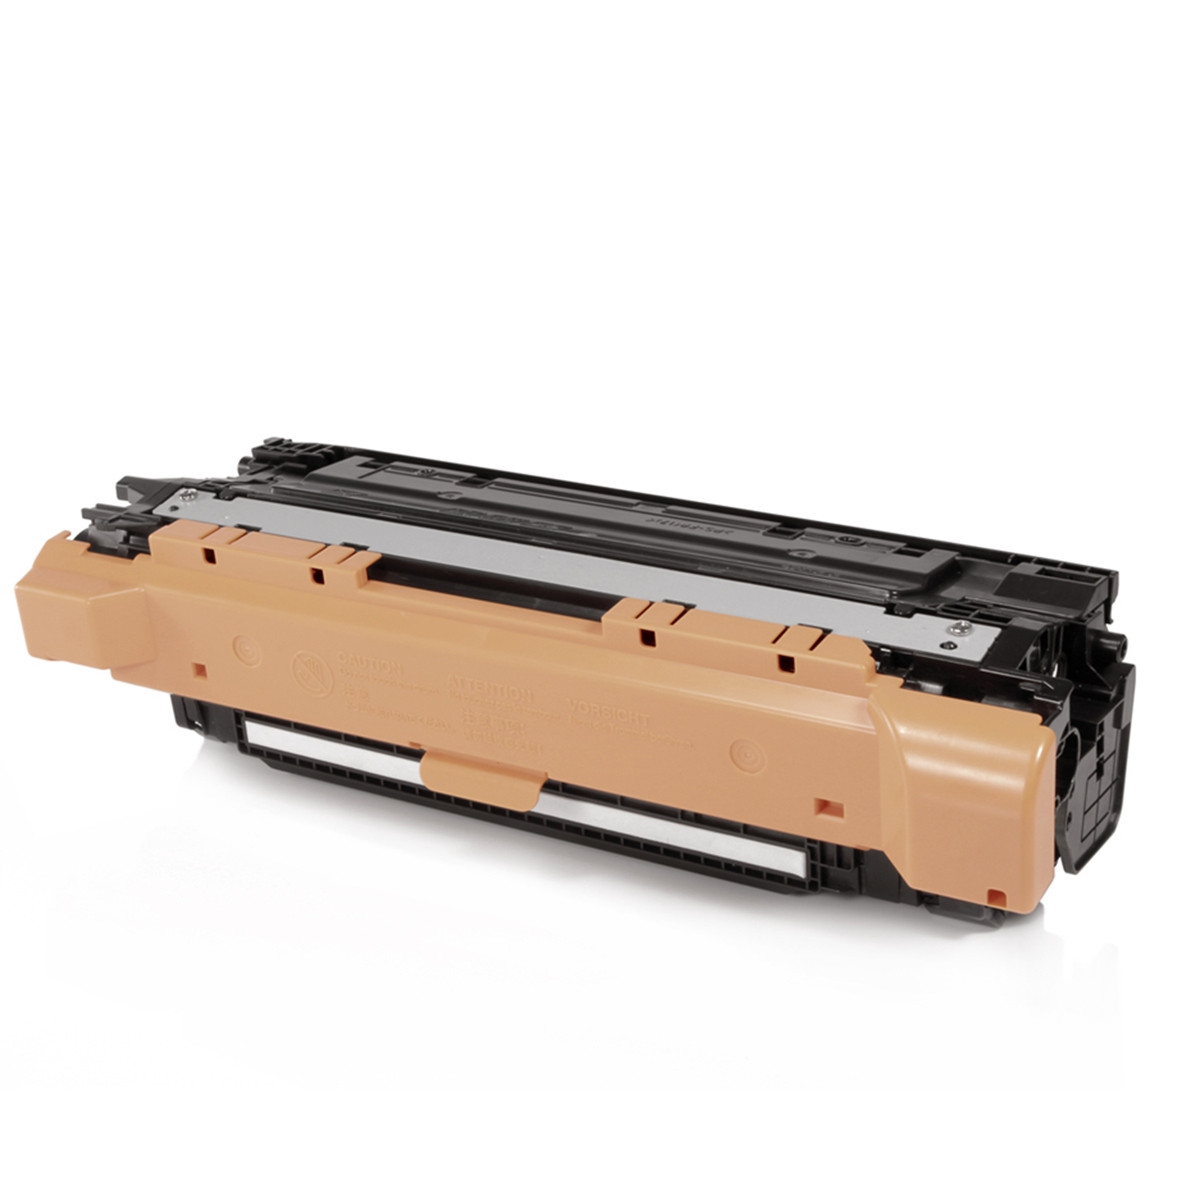 Toner Compatível com HP CE261A Ciano | CP4025 4520 CM4540 4025DN 4520DN 4525DN | Importado 10.5k